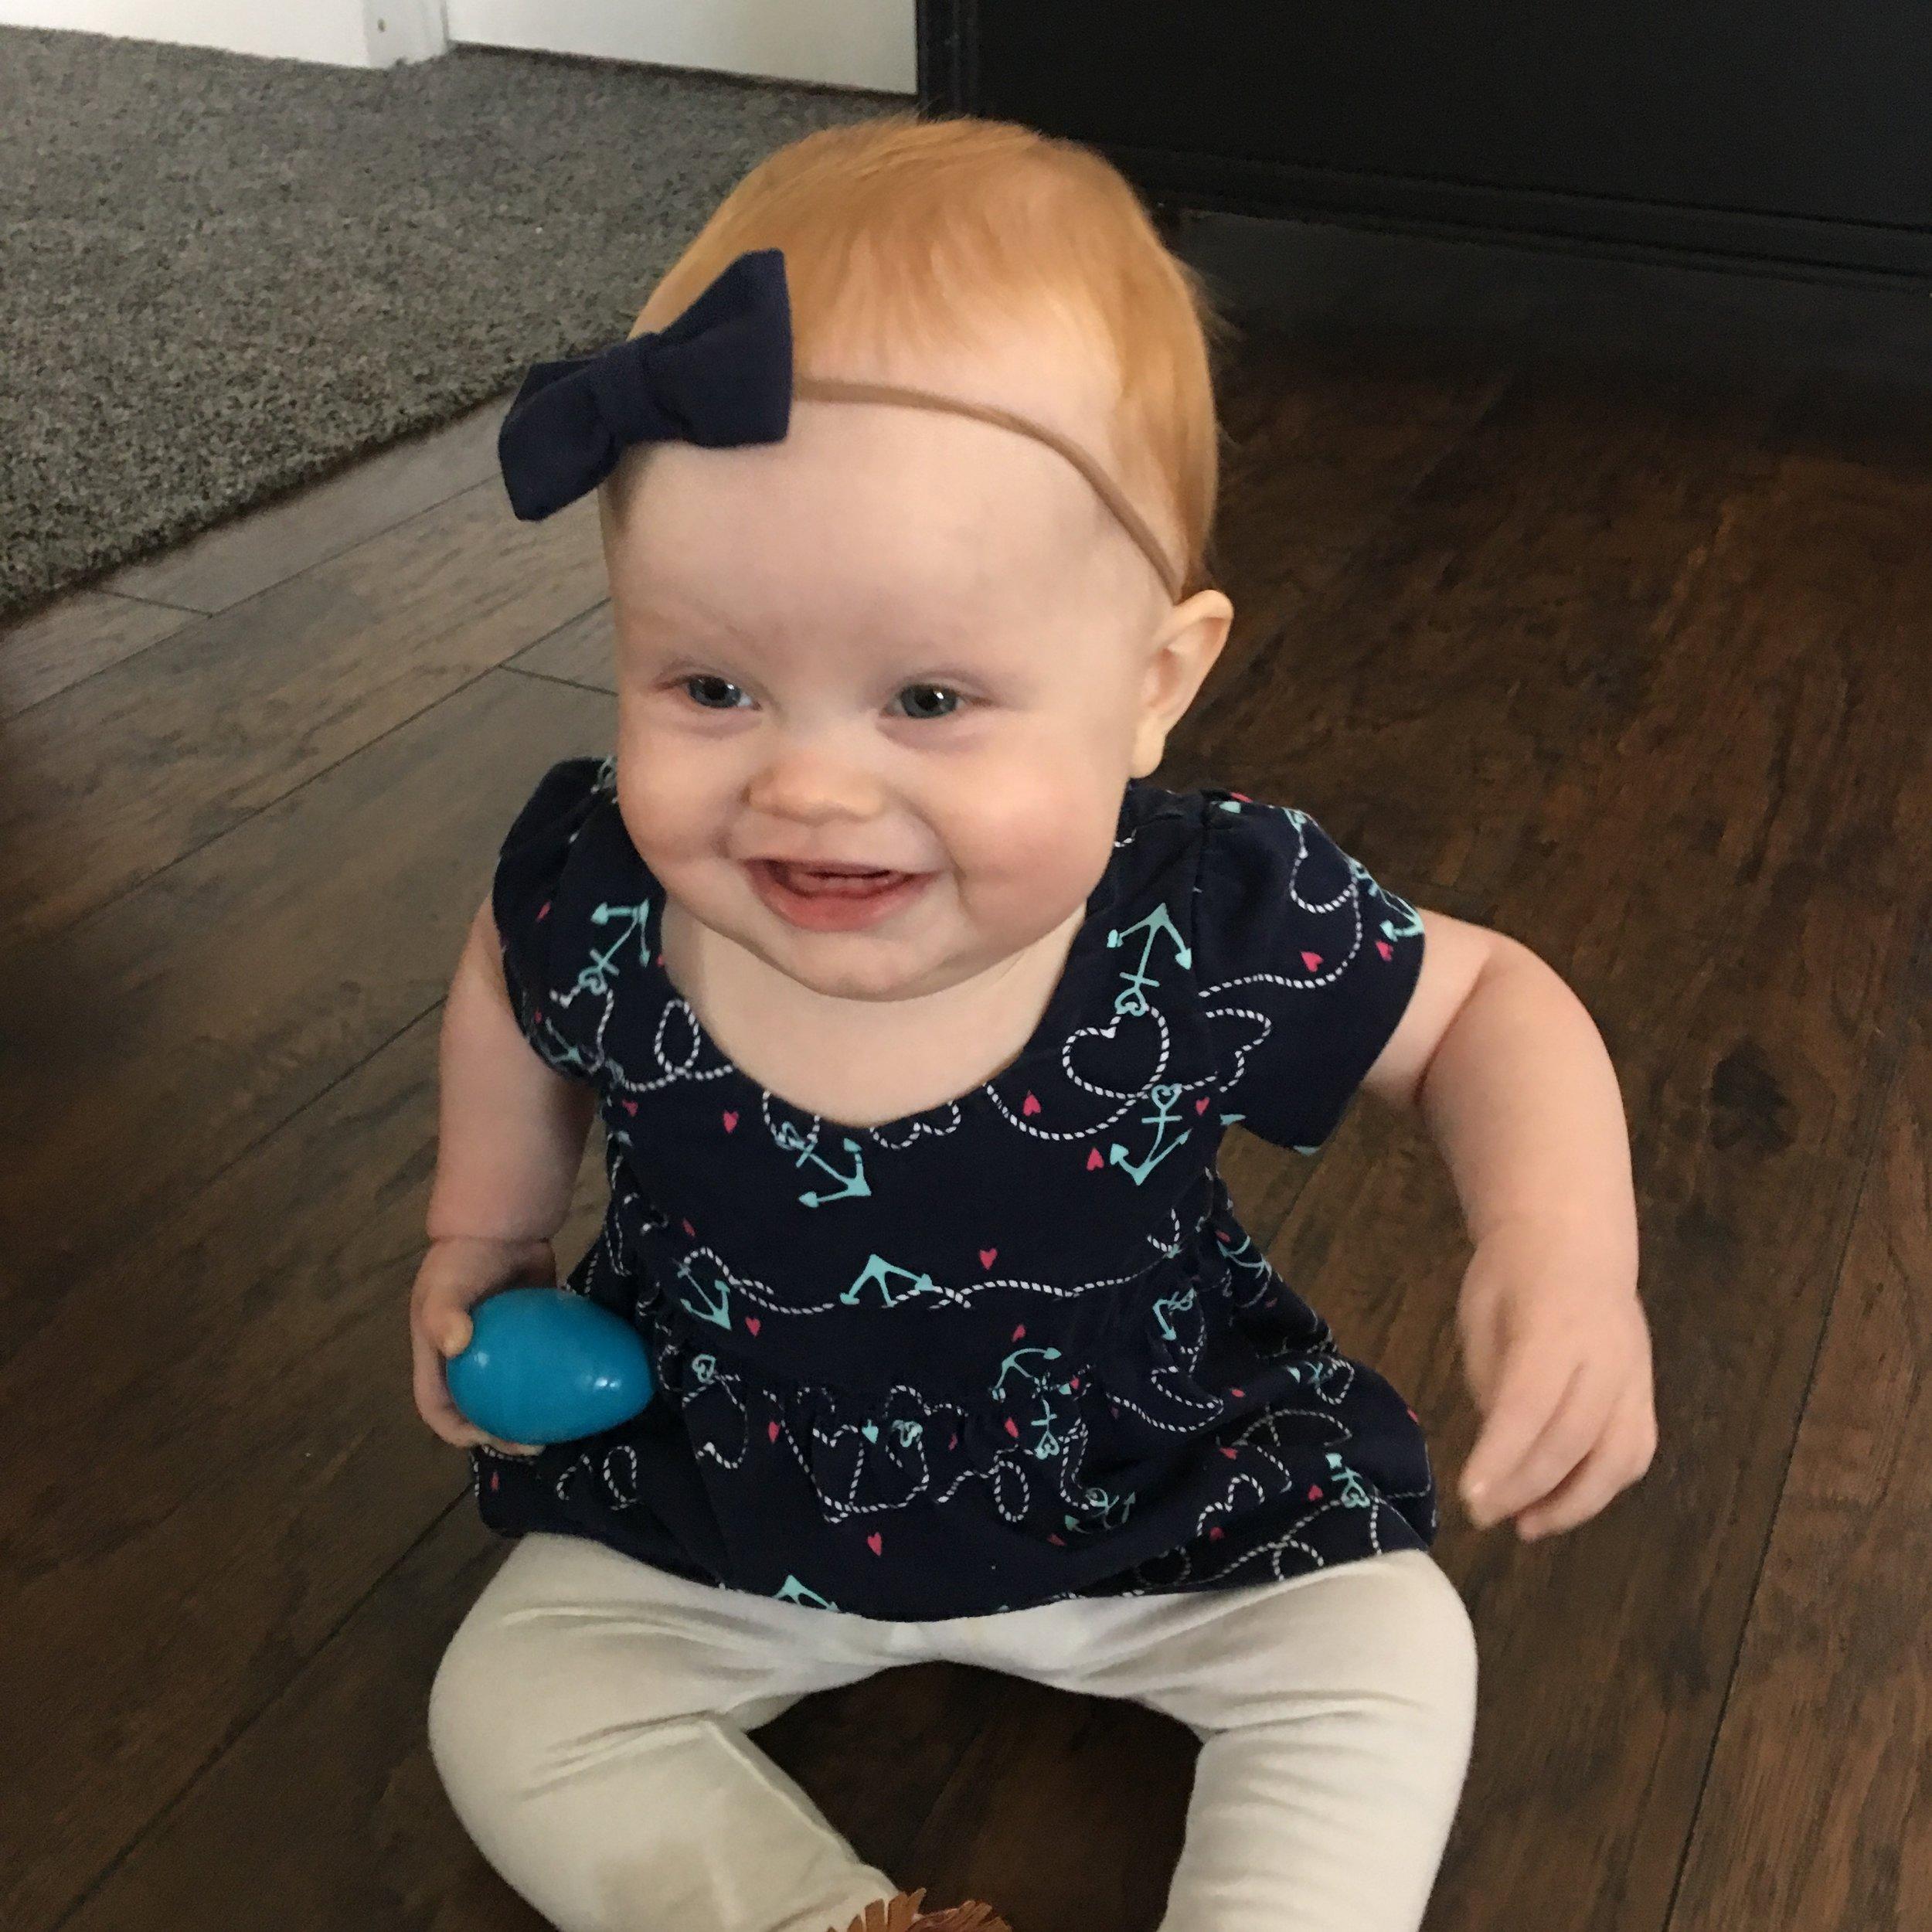 So much joy in one tiny body!